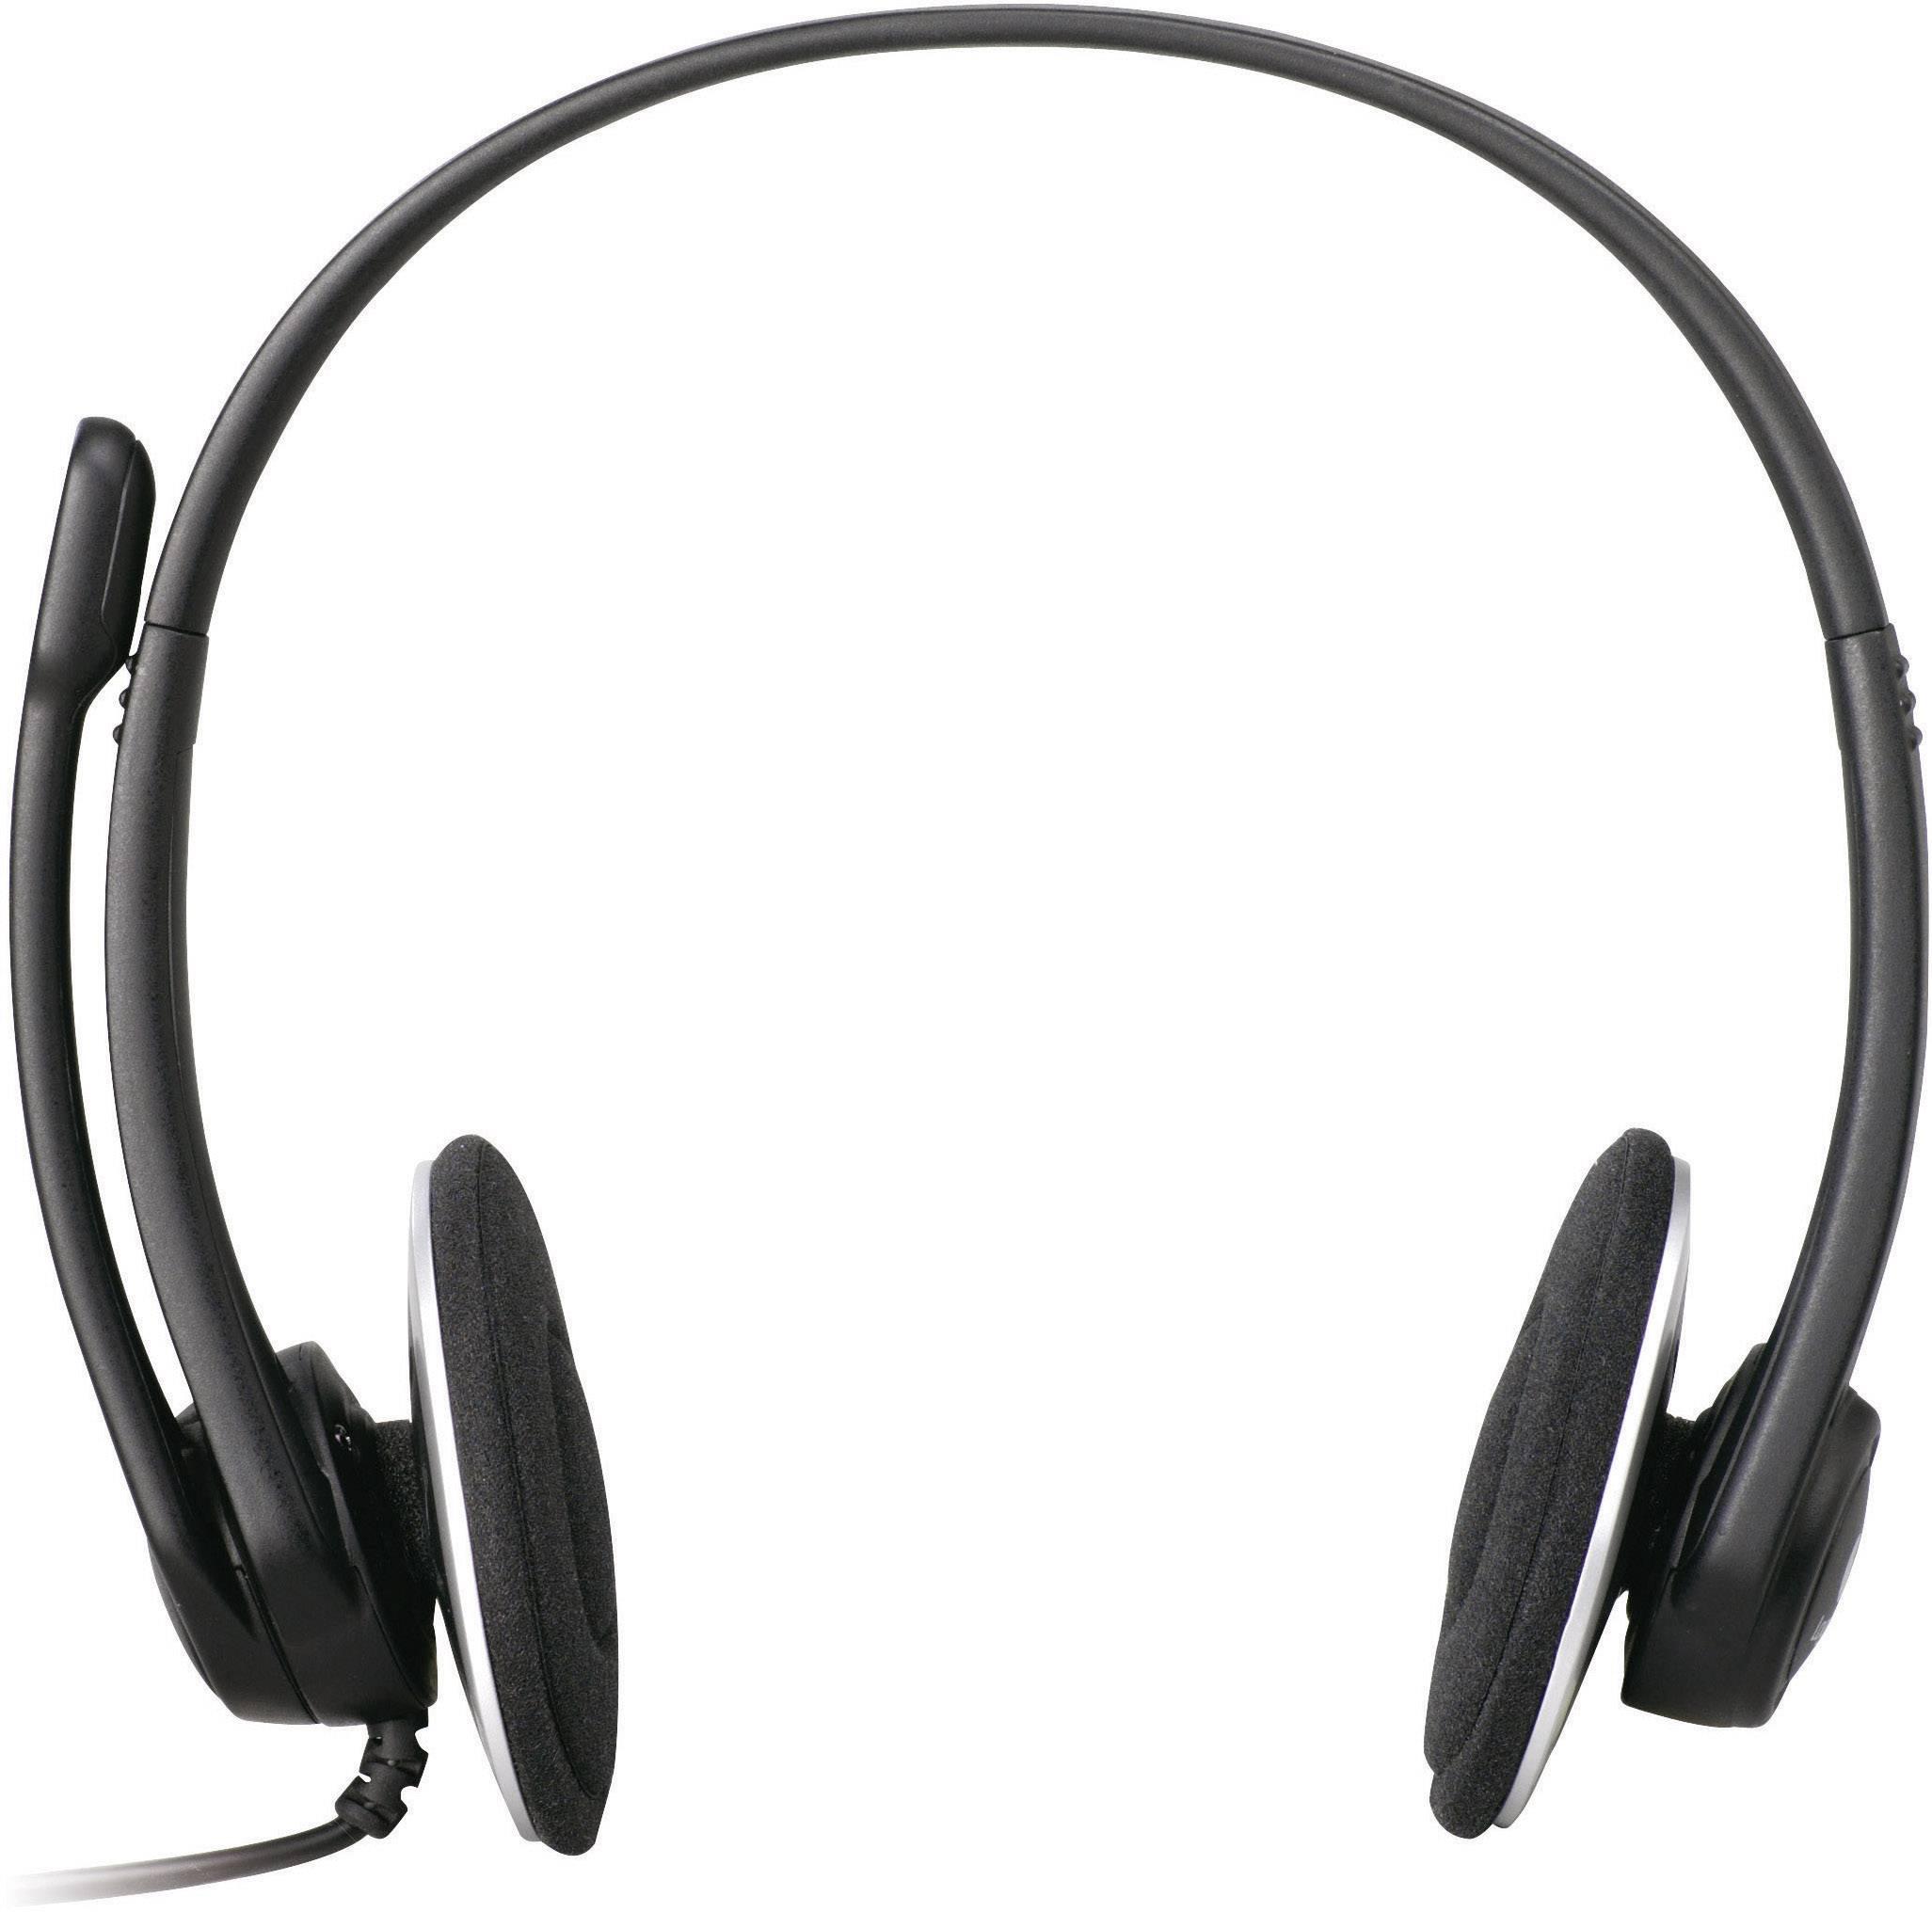 Logitech usb headset for mac